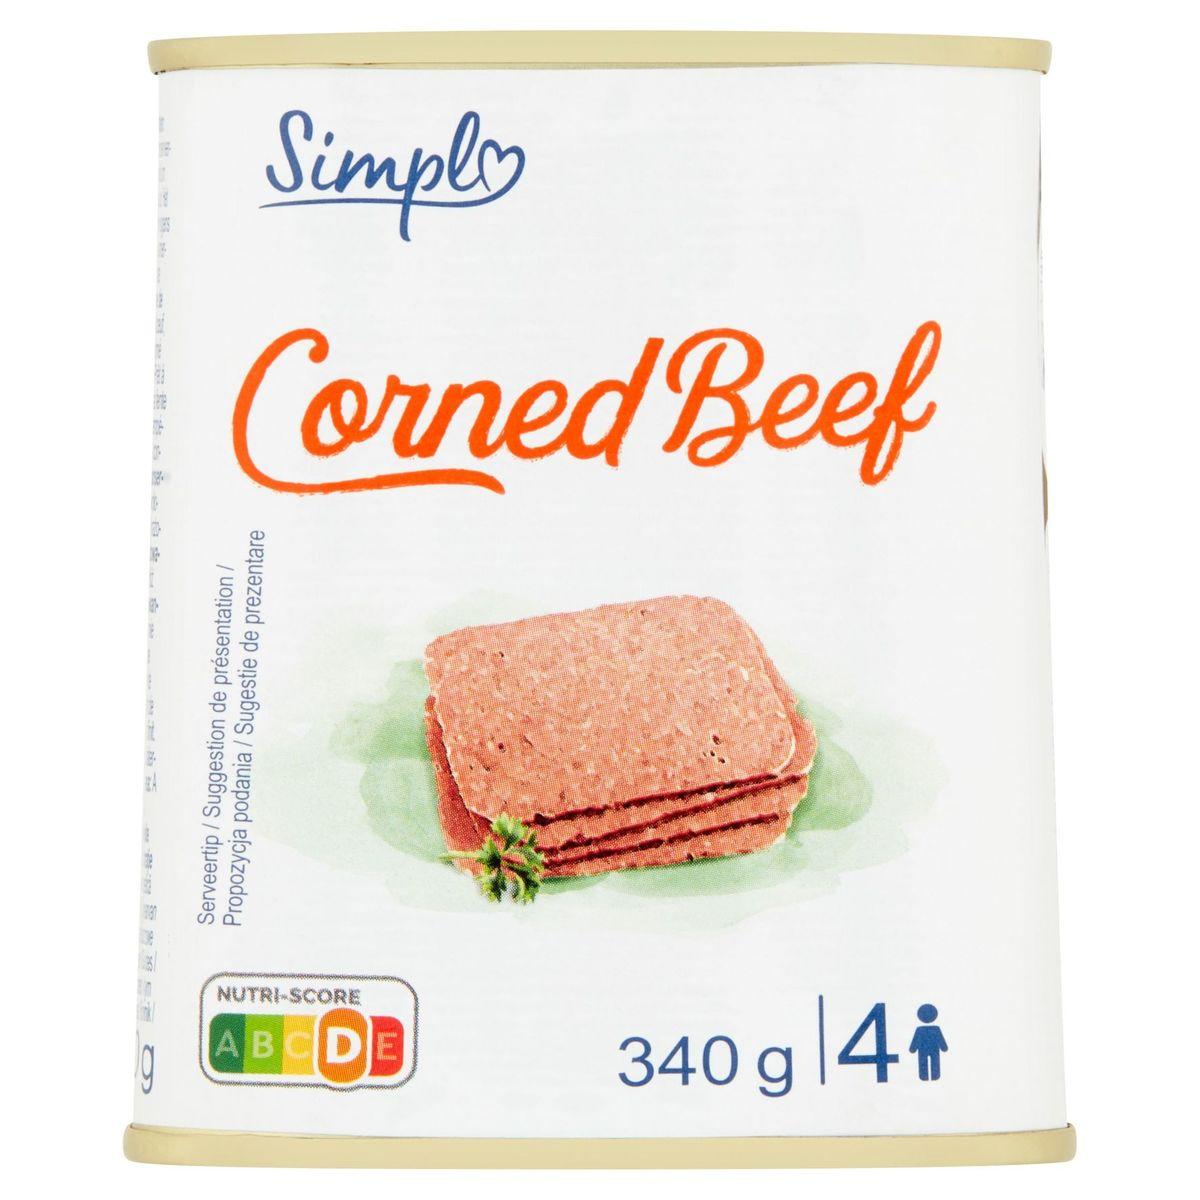 Simpl Corned Beef 340 g